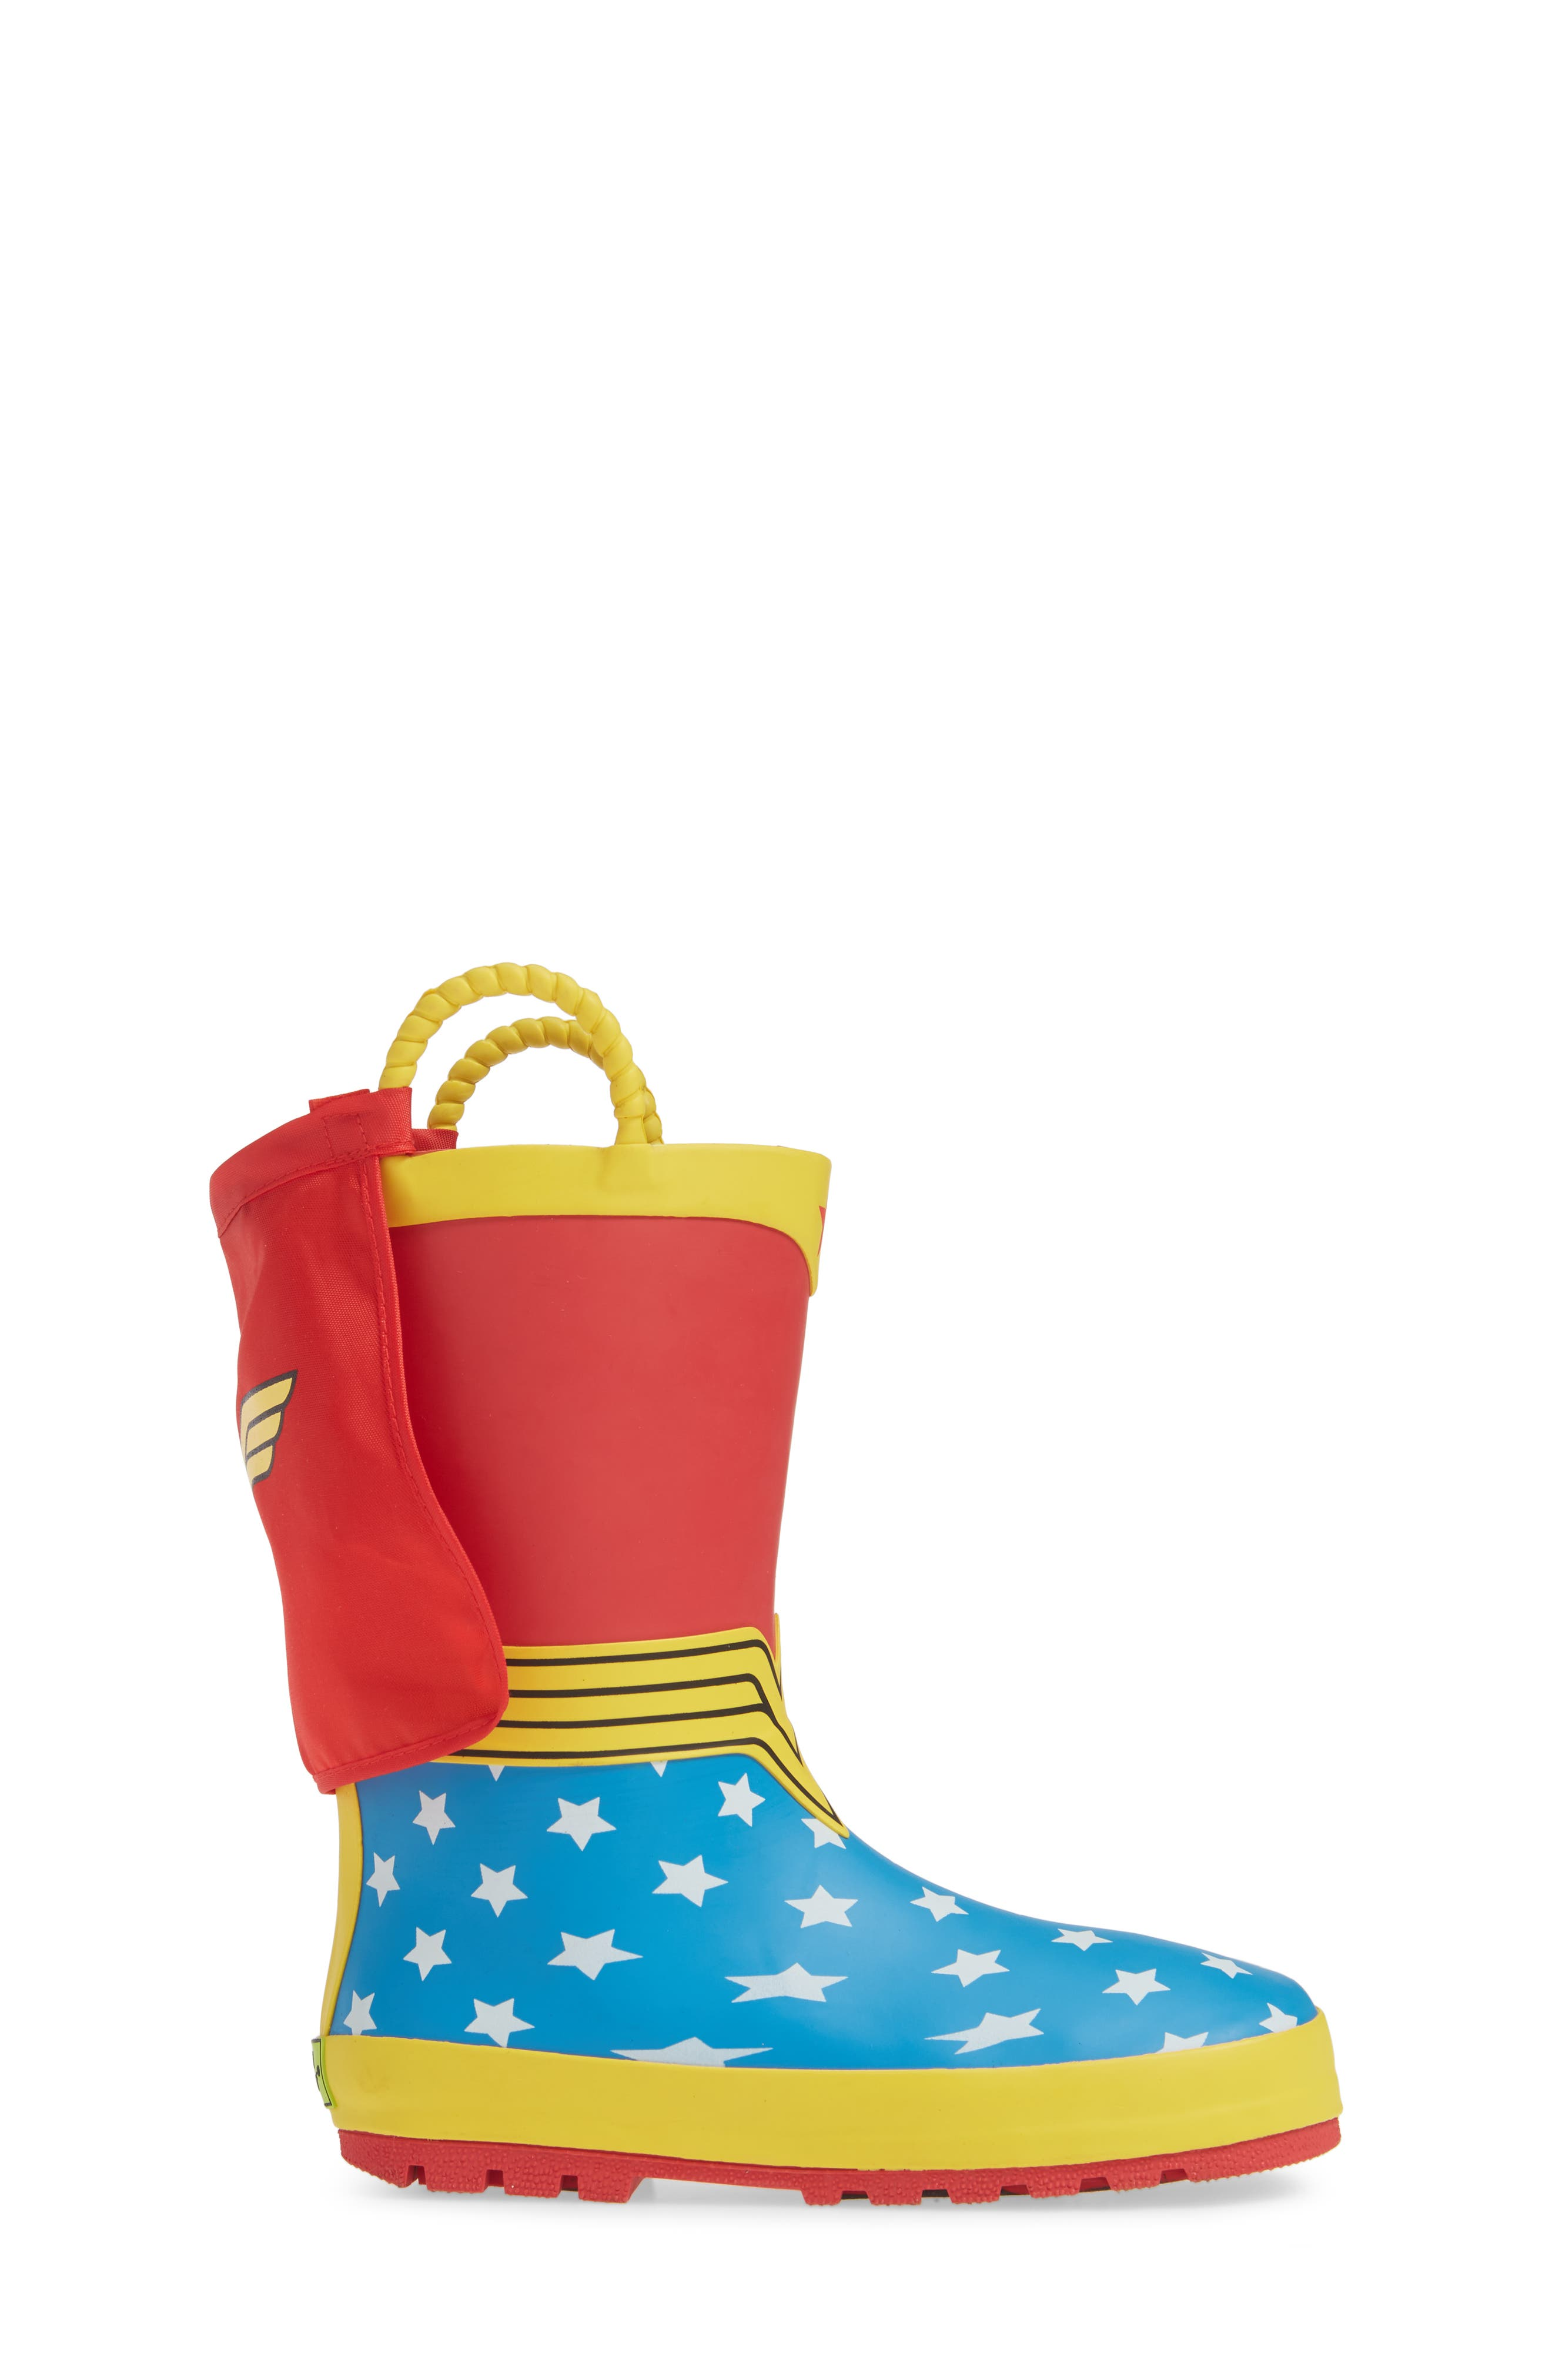 WESTERN CHIEF,                             Wonder Woman Waterproof Rain Boot,                             Alternate thumbnail 3, color,                             RED